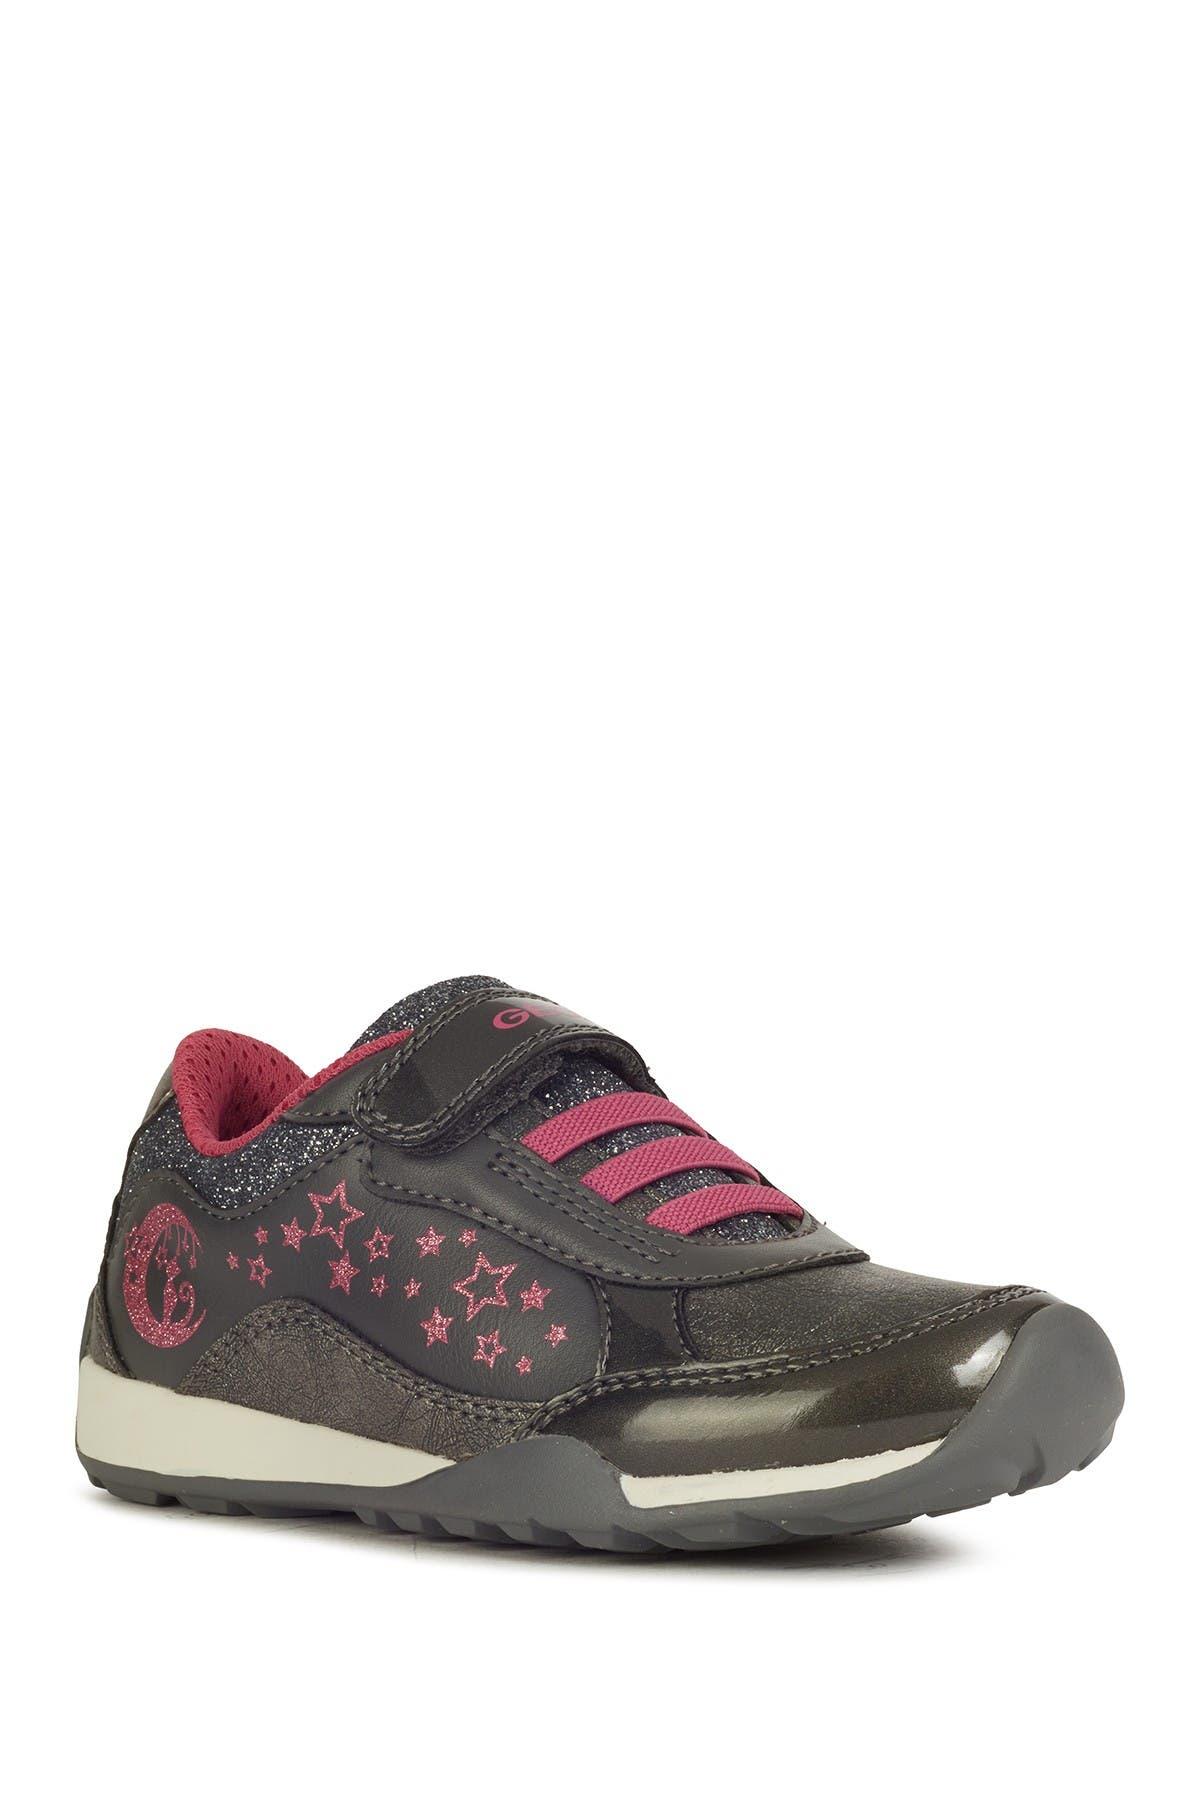 Image of GEOX Jocker Plus Girl 2 Sneaker